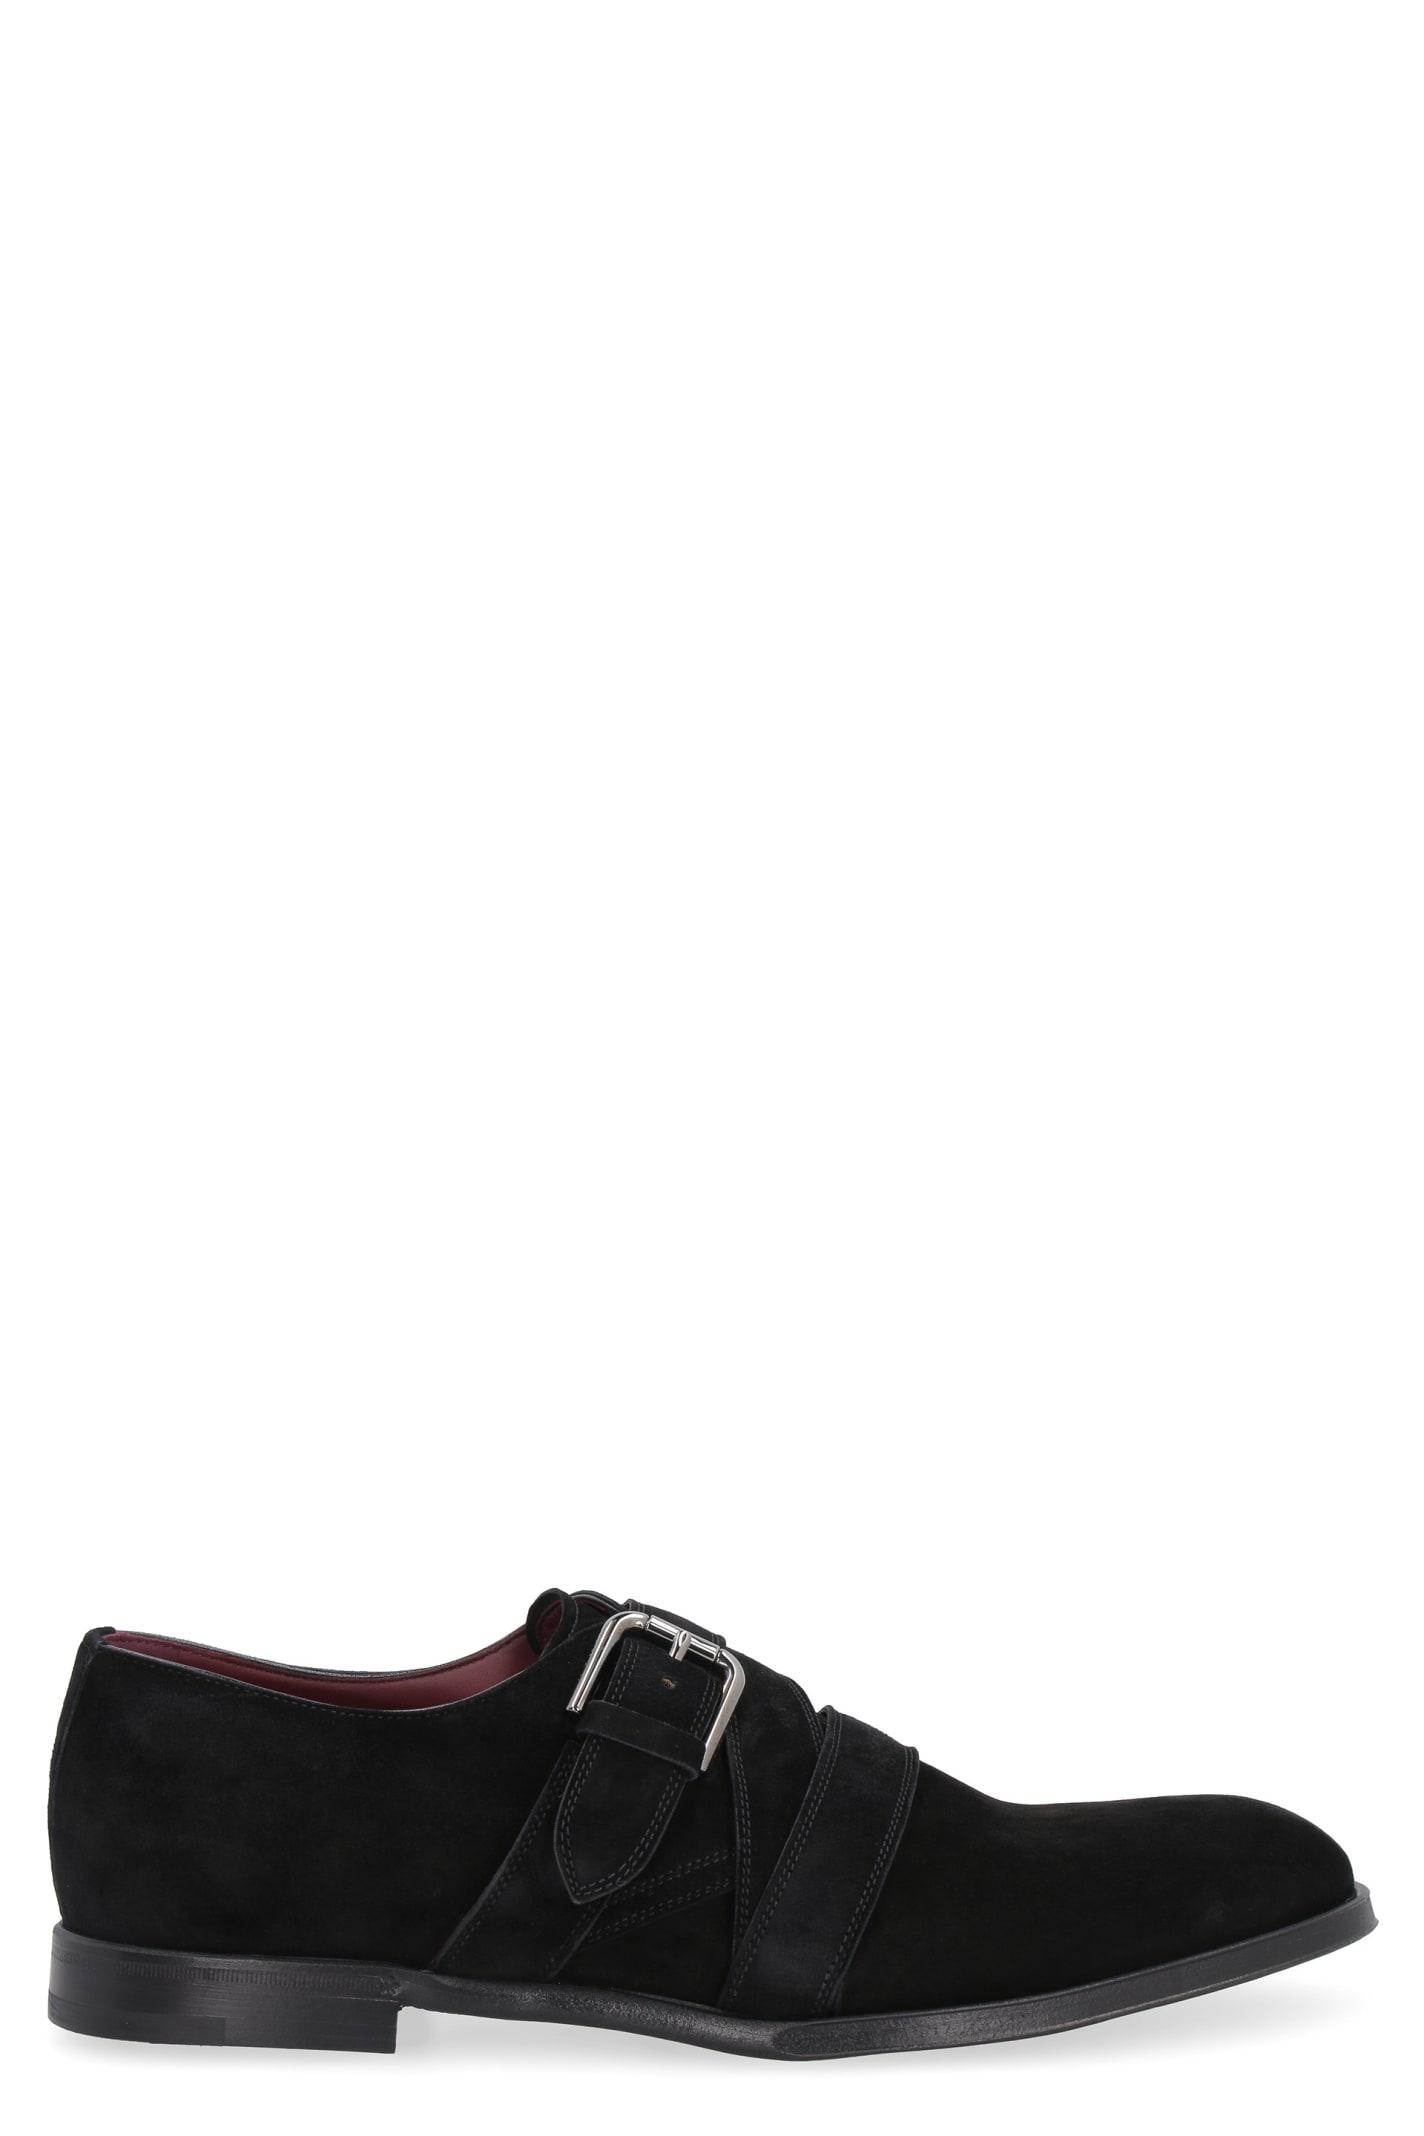 Dolce & Gabbana Suede Monk-strap Shoes